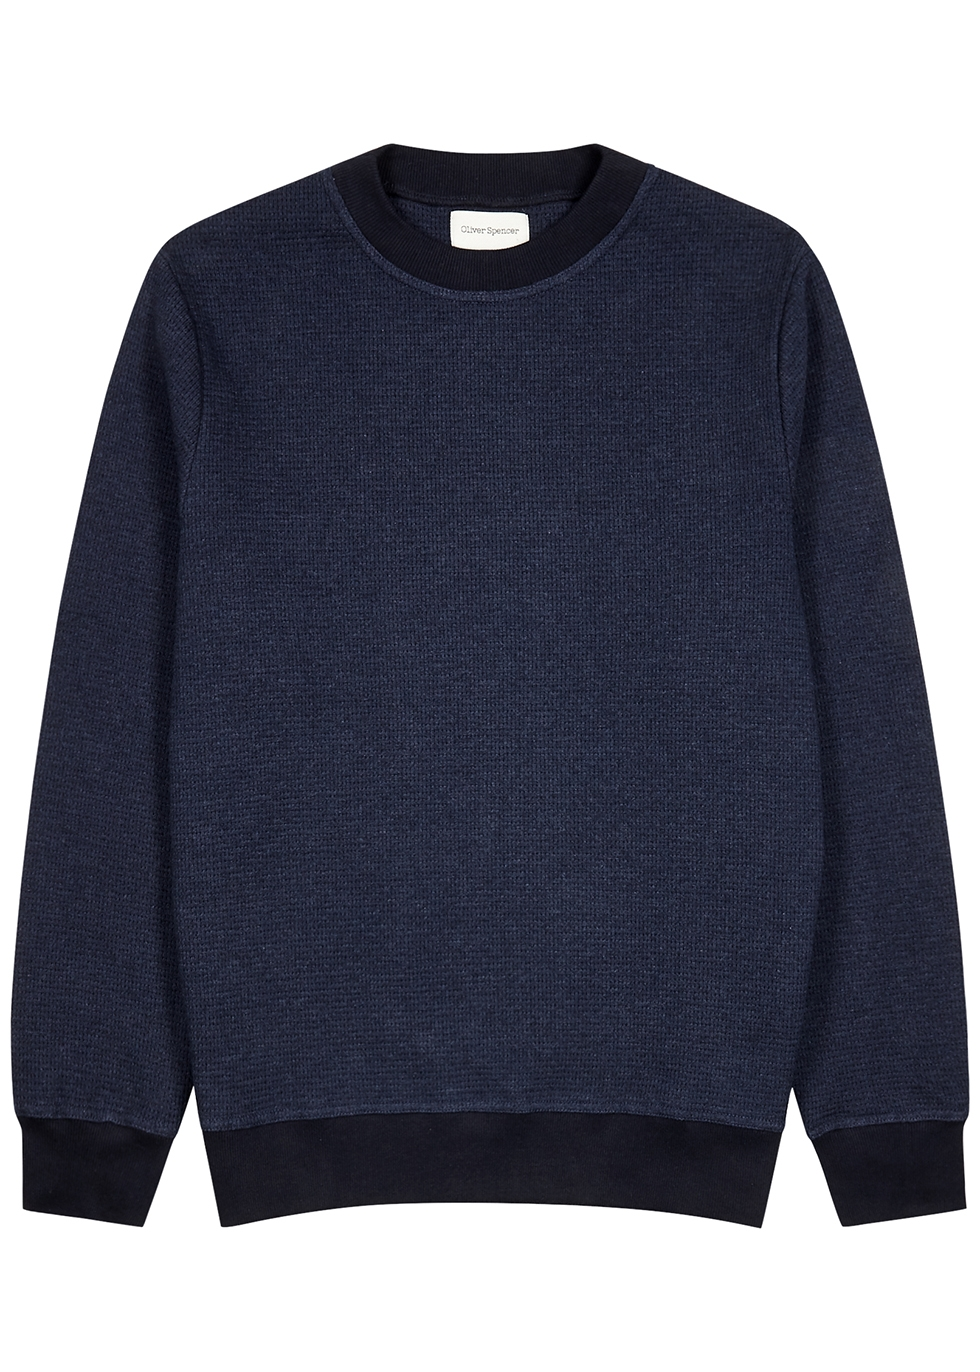 Robin navy waffle-knit cotton sweatshirt